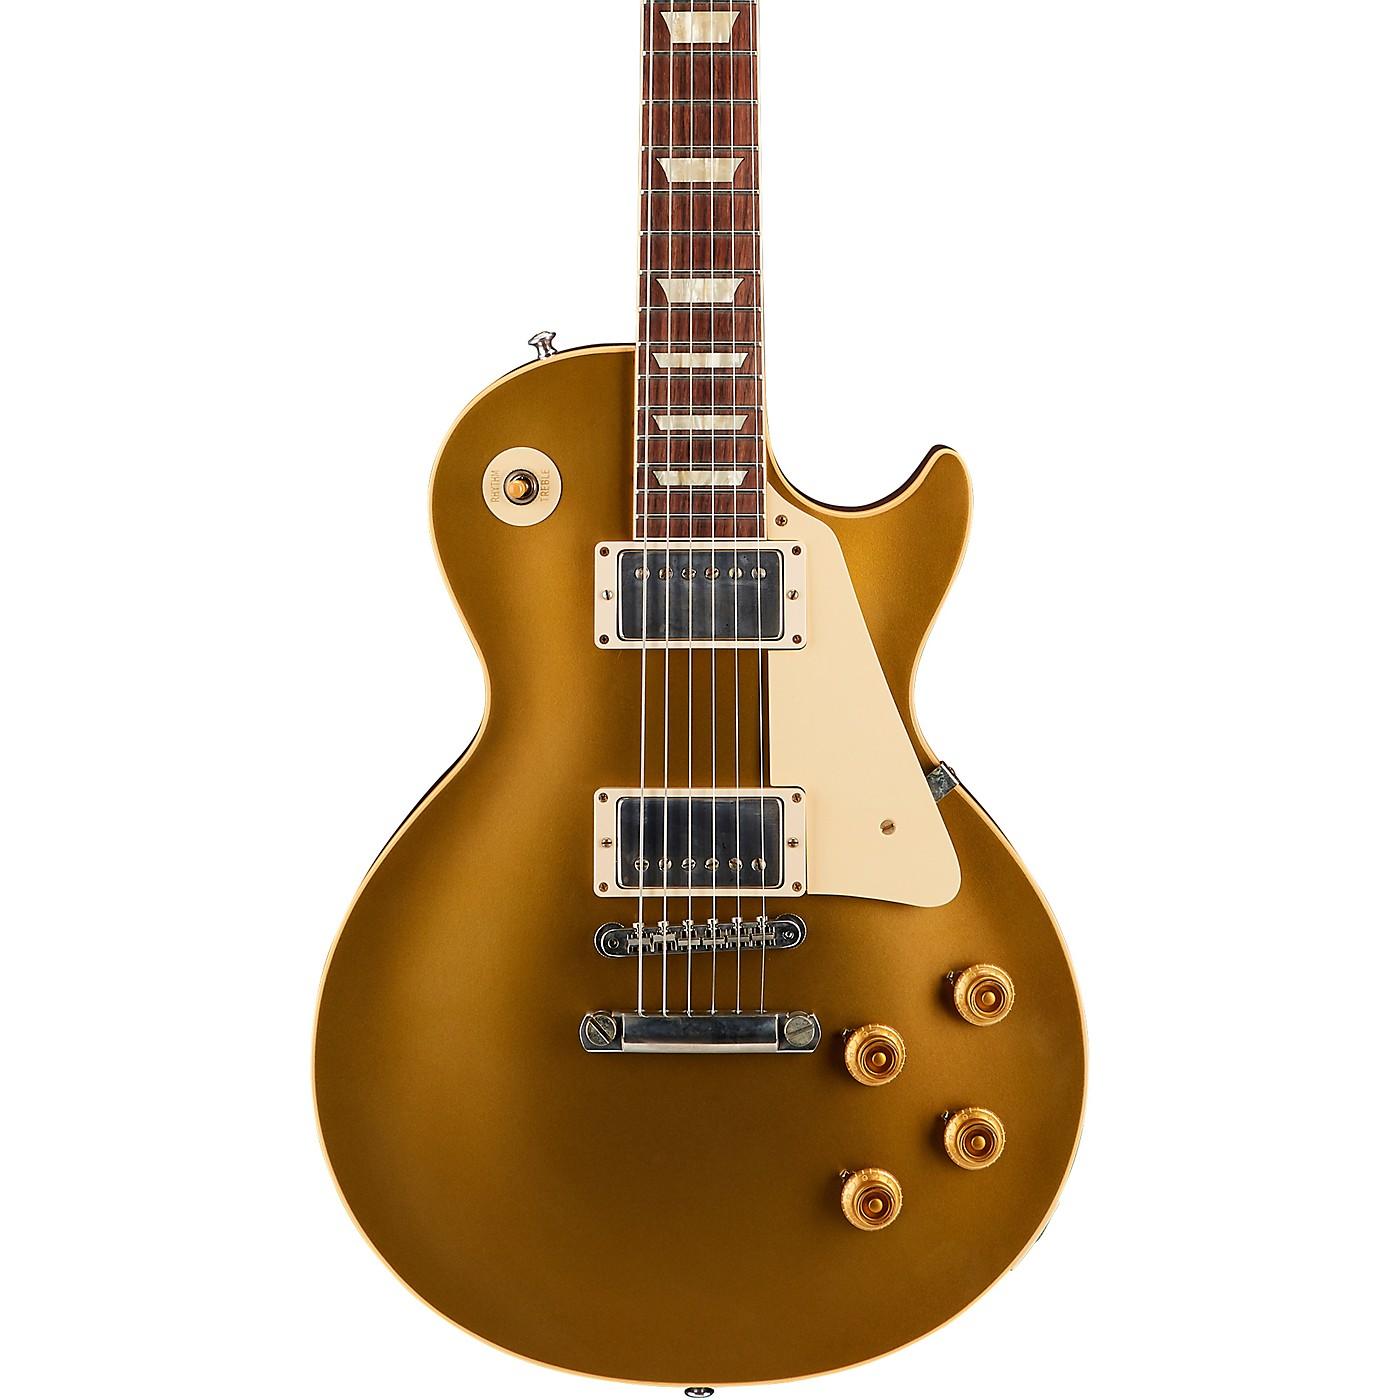 Gibson Custom 1957 Les Paul Goldtop Darkback Reissue VOS Electric Guitar thumbnail